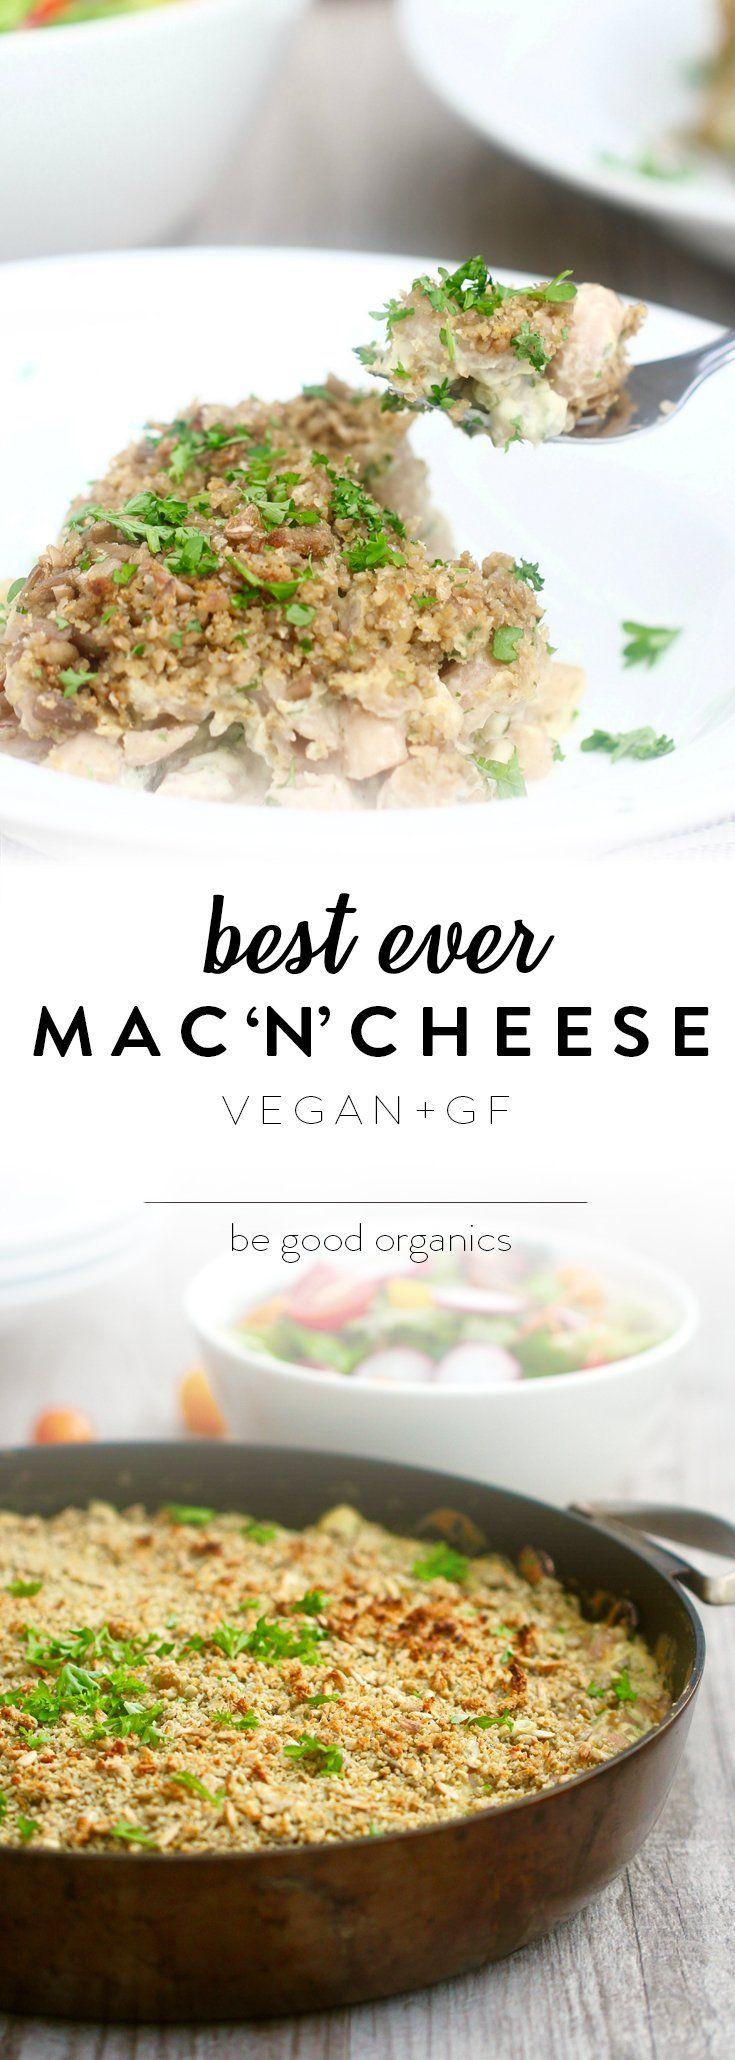 Best Ever Macaroni Cheese - Be Good Organics